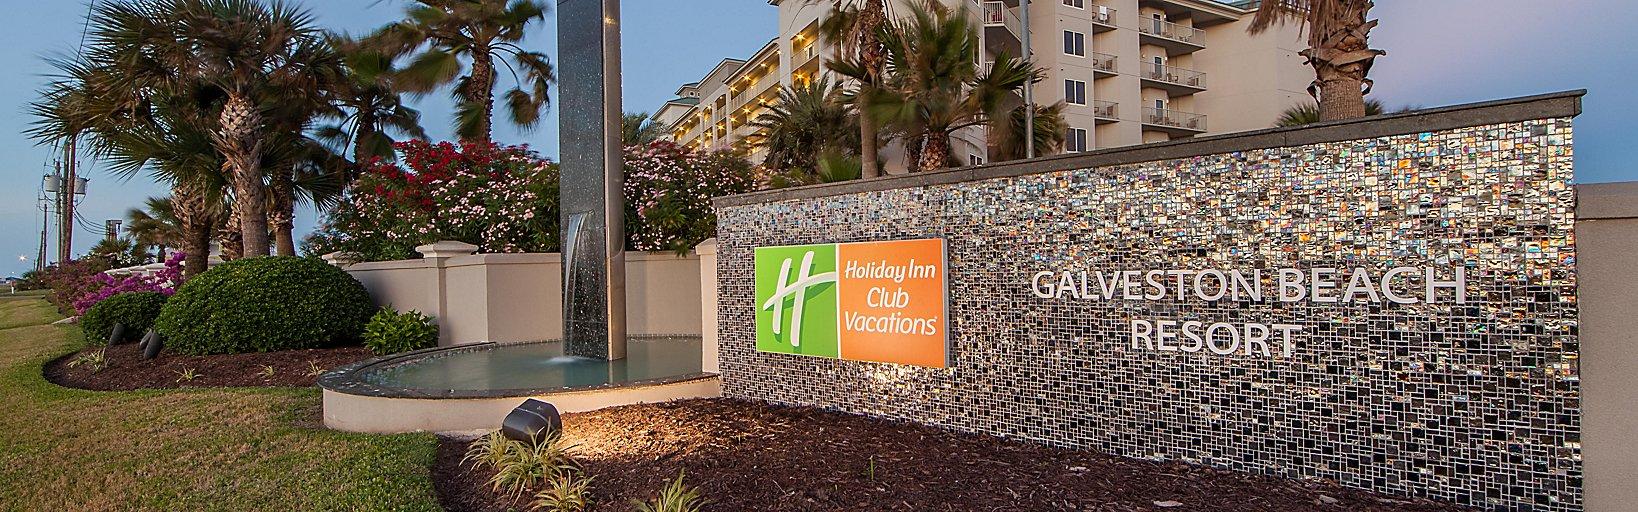 Holiday Inn Club Vacations Galveston